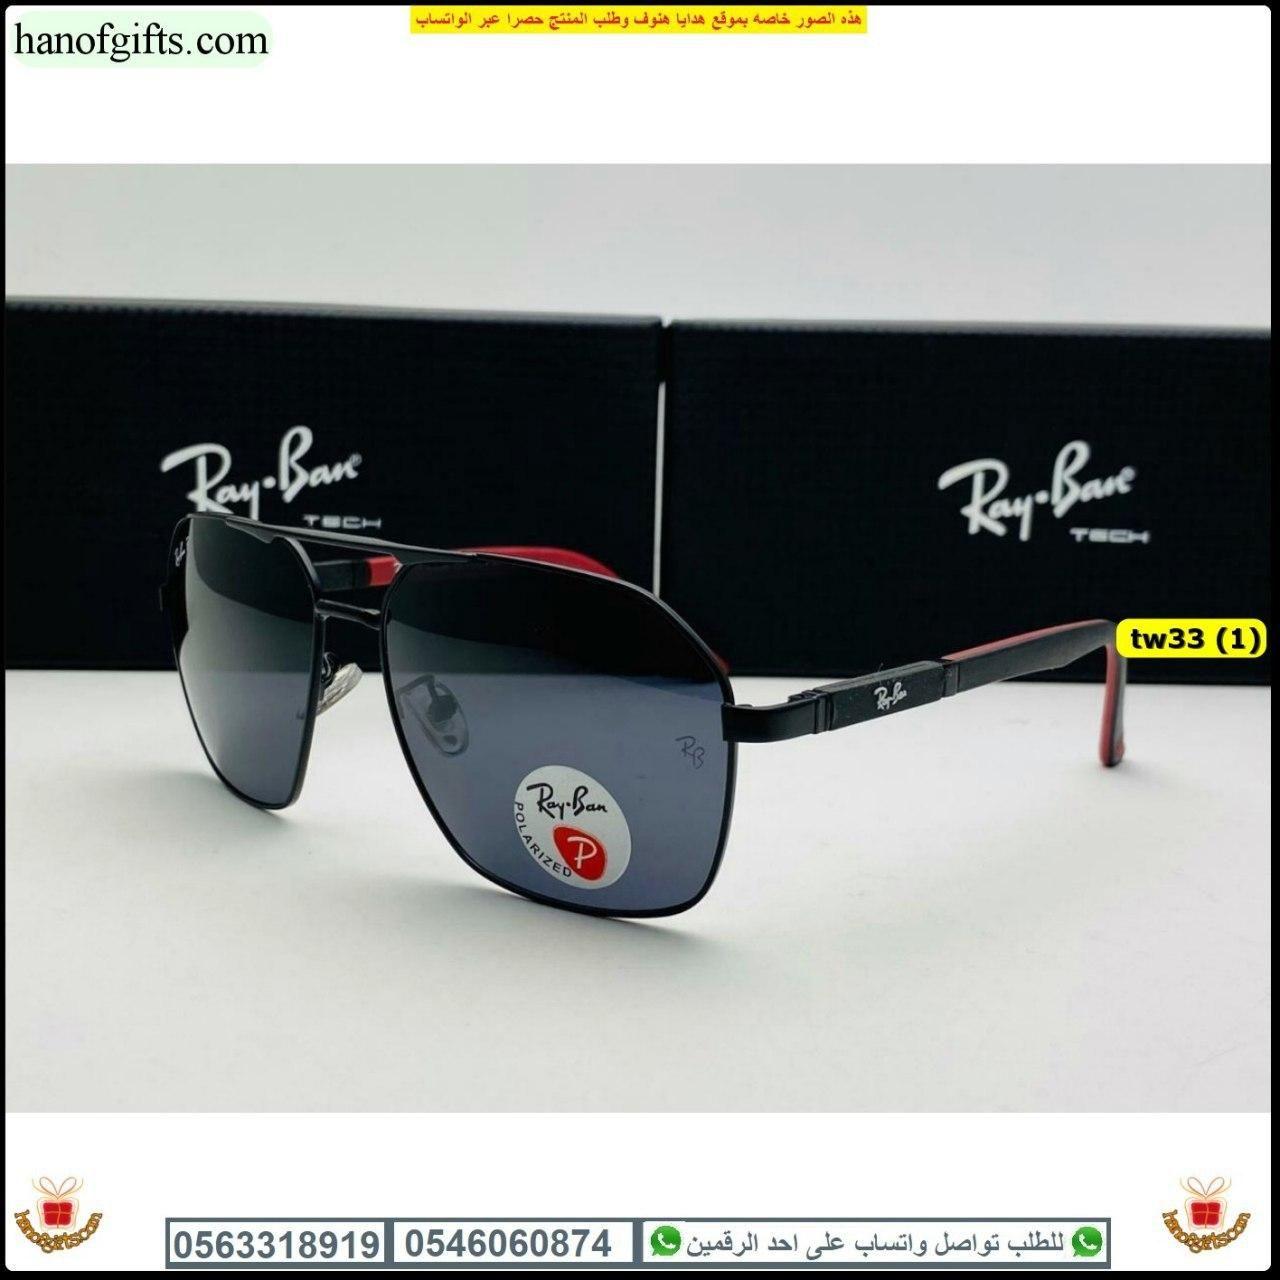 نظارات ريبان ٢٠٢٠ مع علبة و كرت الماركه درجة اولى هدايا هنوف Oakley Sunglasses Sunglasses Glasses